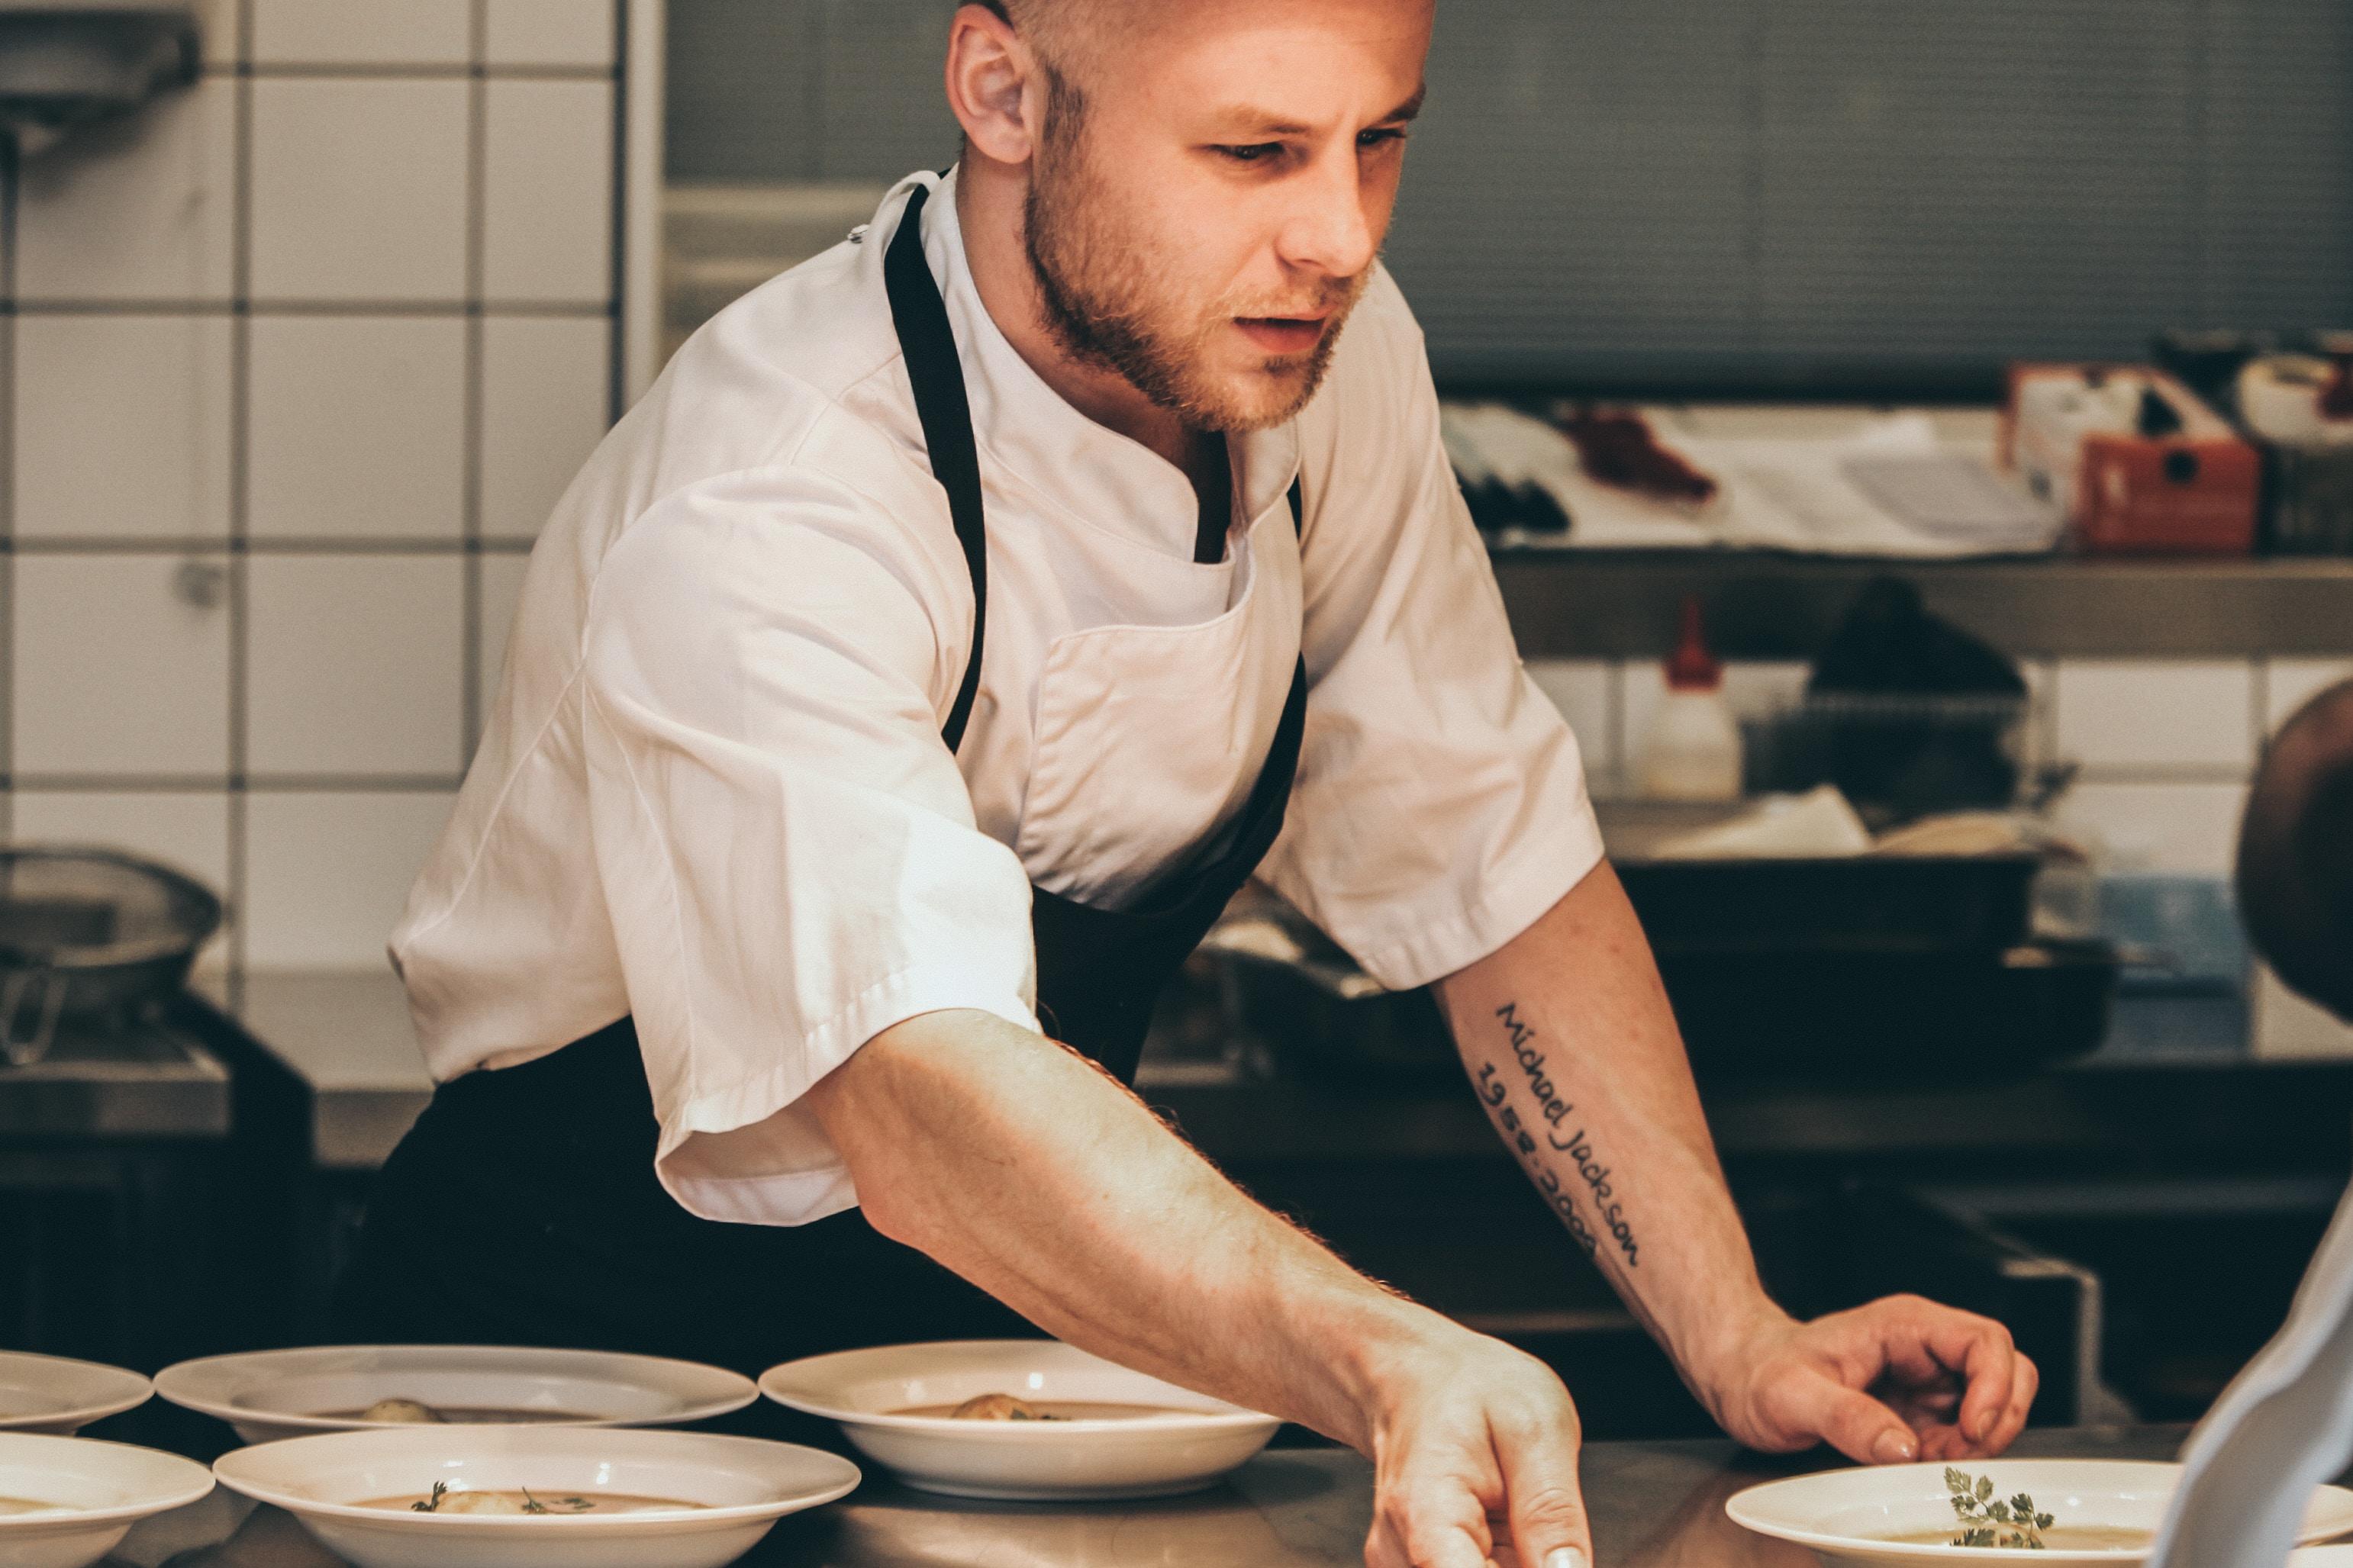 chef making dish inside the kitchen